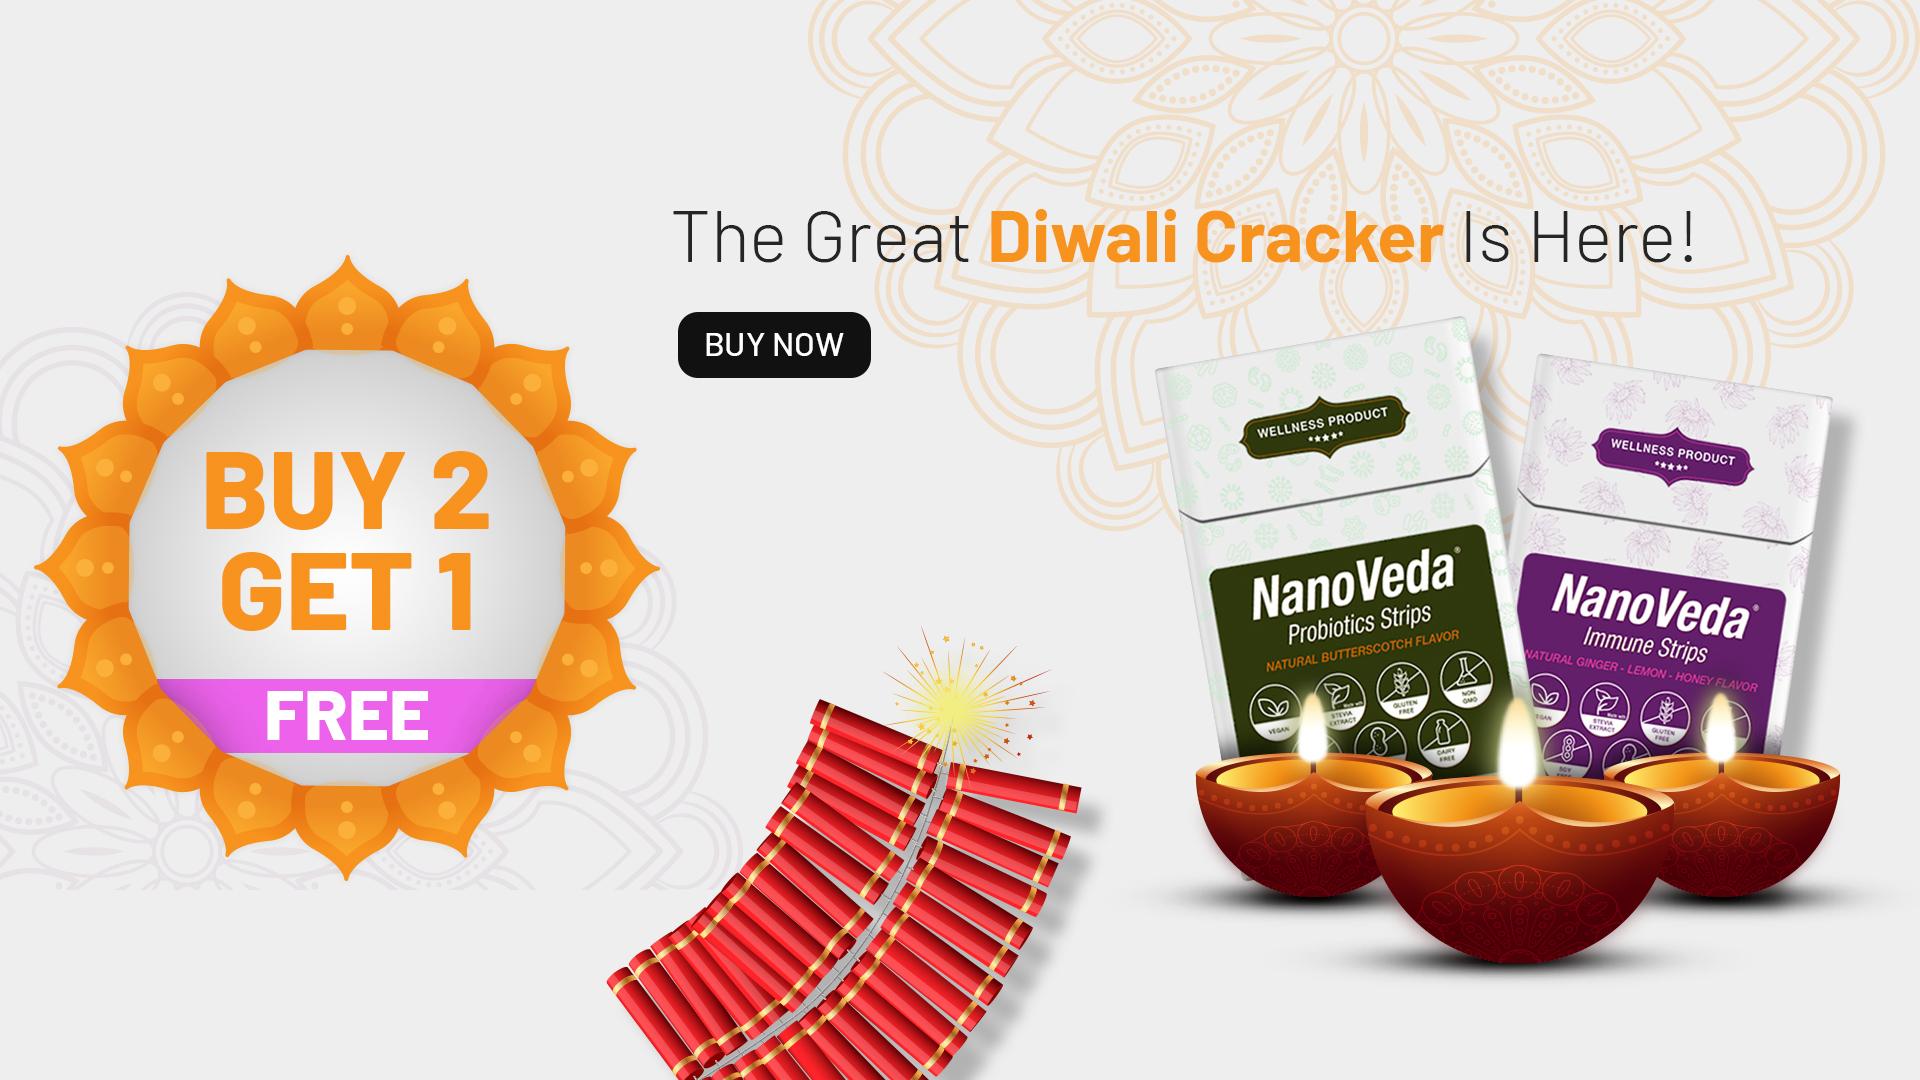 NanoVeda Diwali Cracker